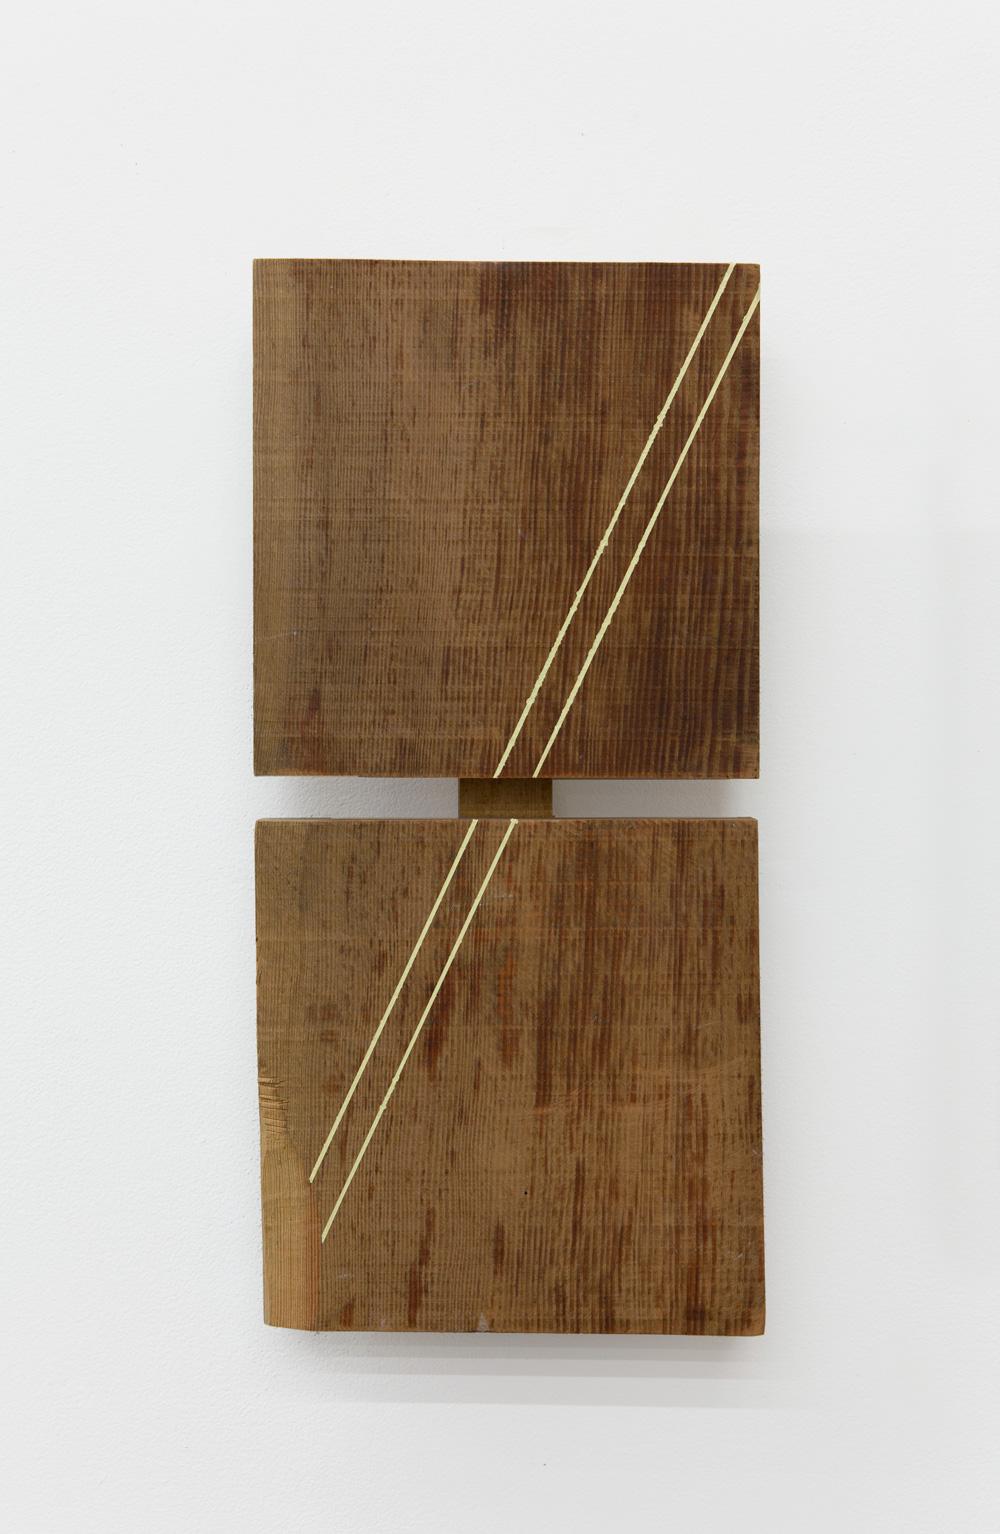 Corresponding , 2005 相置体 ( Sōchitai ) Wood, acrylic 16 3/8 x 7 5/8 x 2 3/4 inches 41.5 x 19.5 x 7 cm